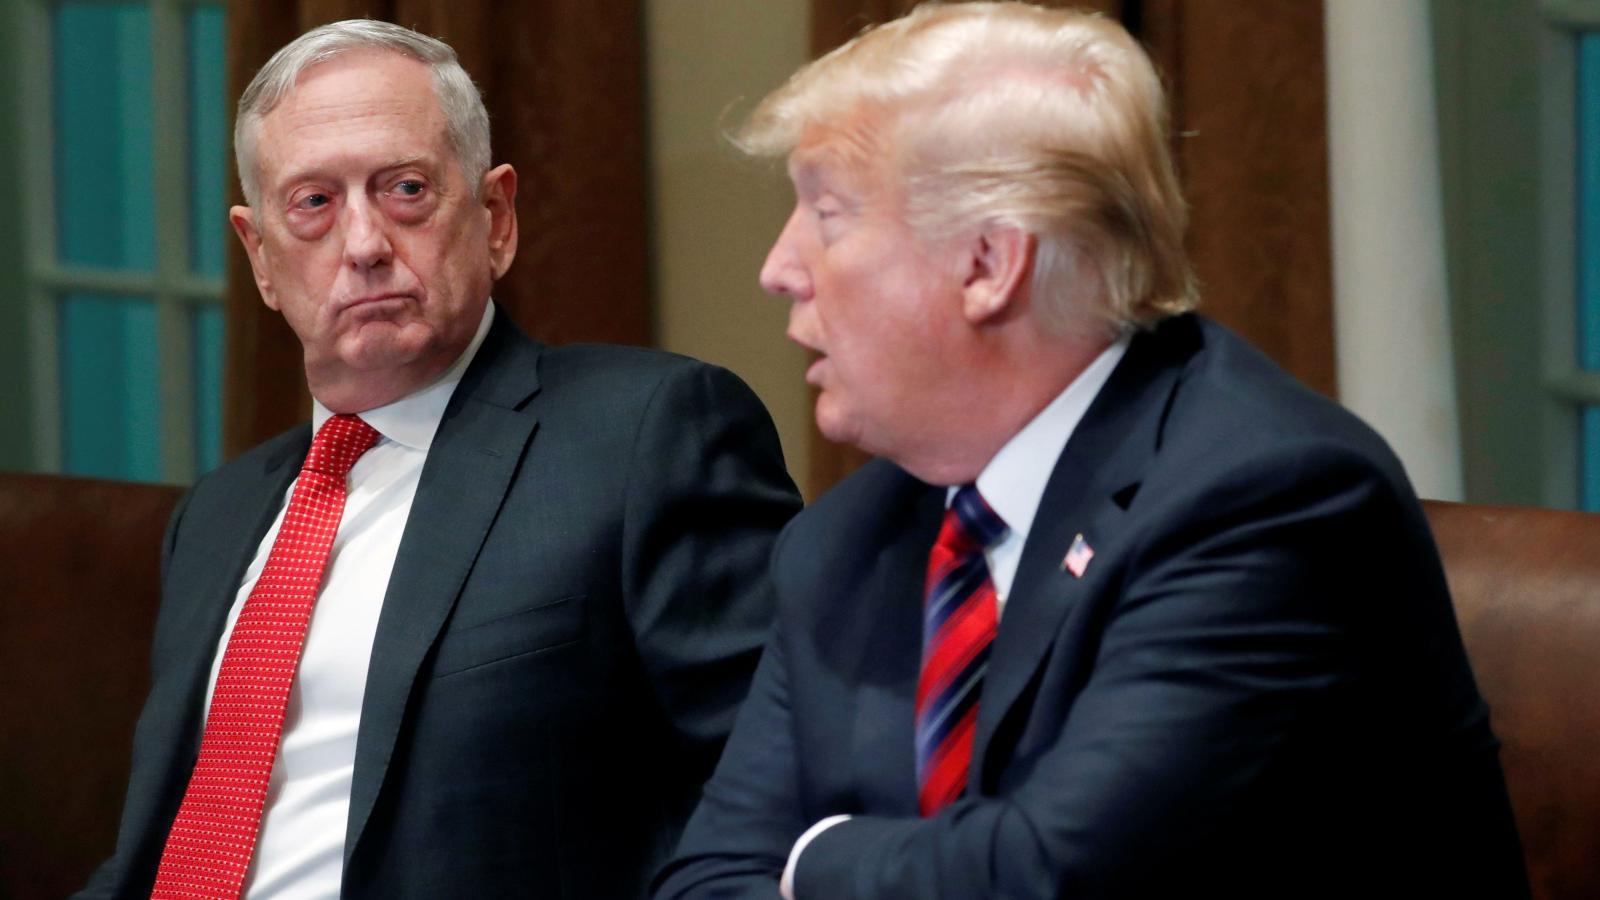 Trump Threatens to Throw His Bone Spurs at Mattis